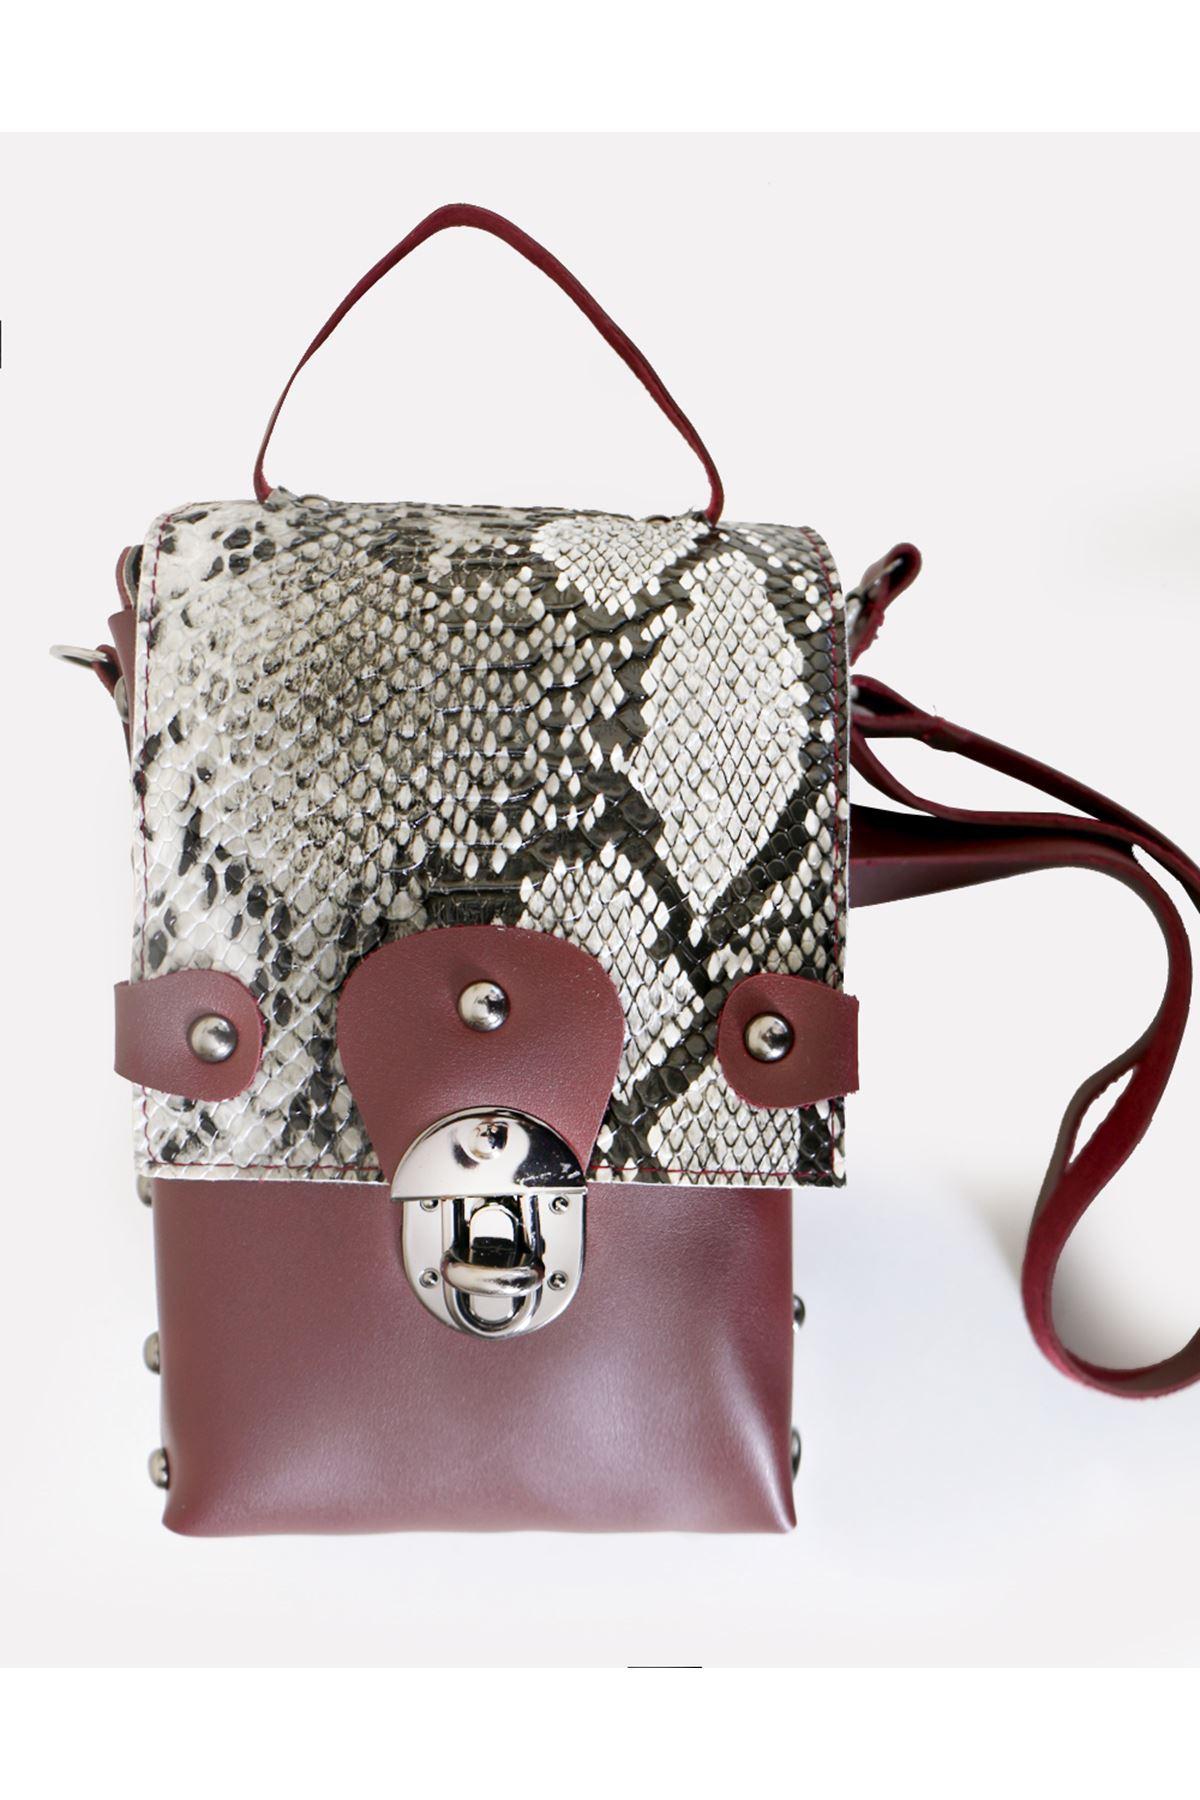 Bordo Yılan Desen Metal Aksesuarlı El ve Çapraz Çanta